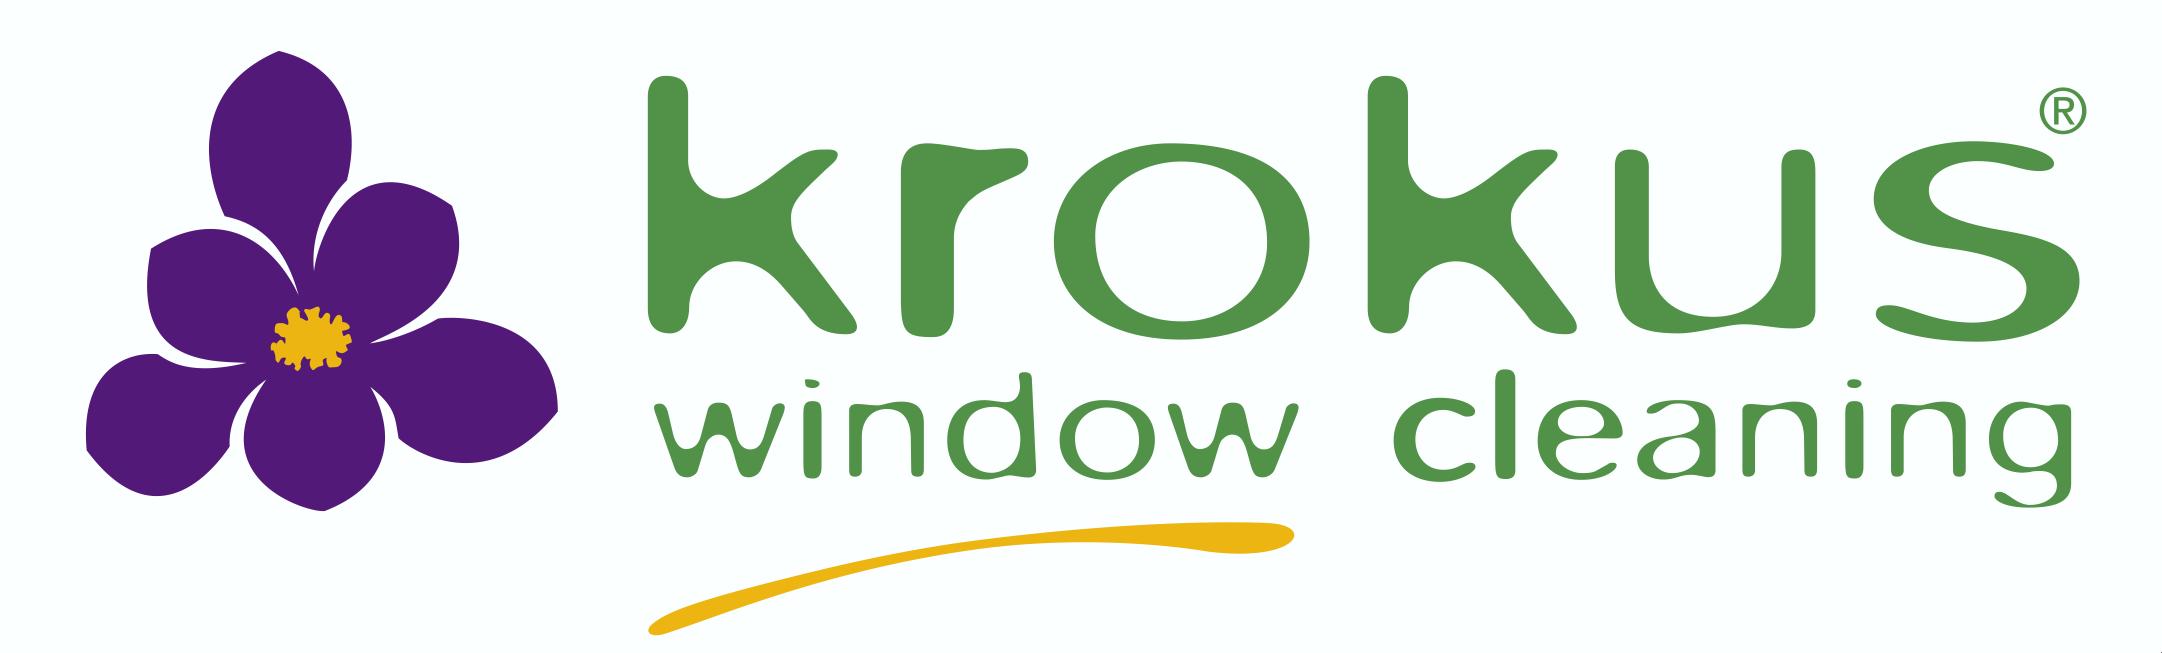 Krokus wc logo krokus window cleaning for 2 good guys window cleaning